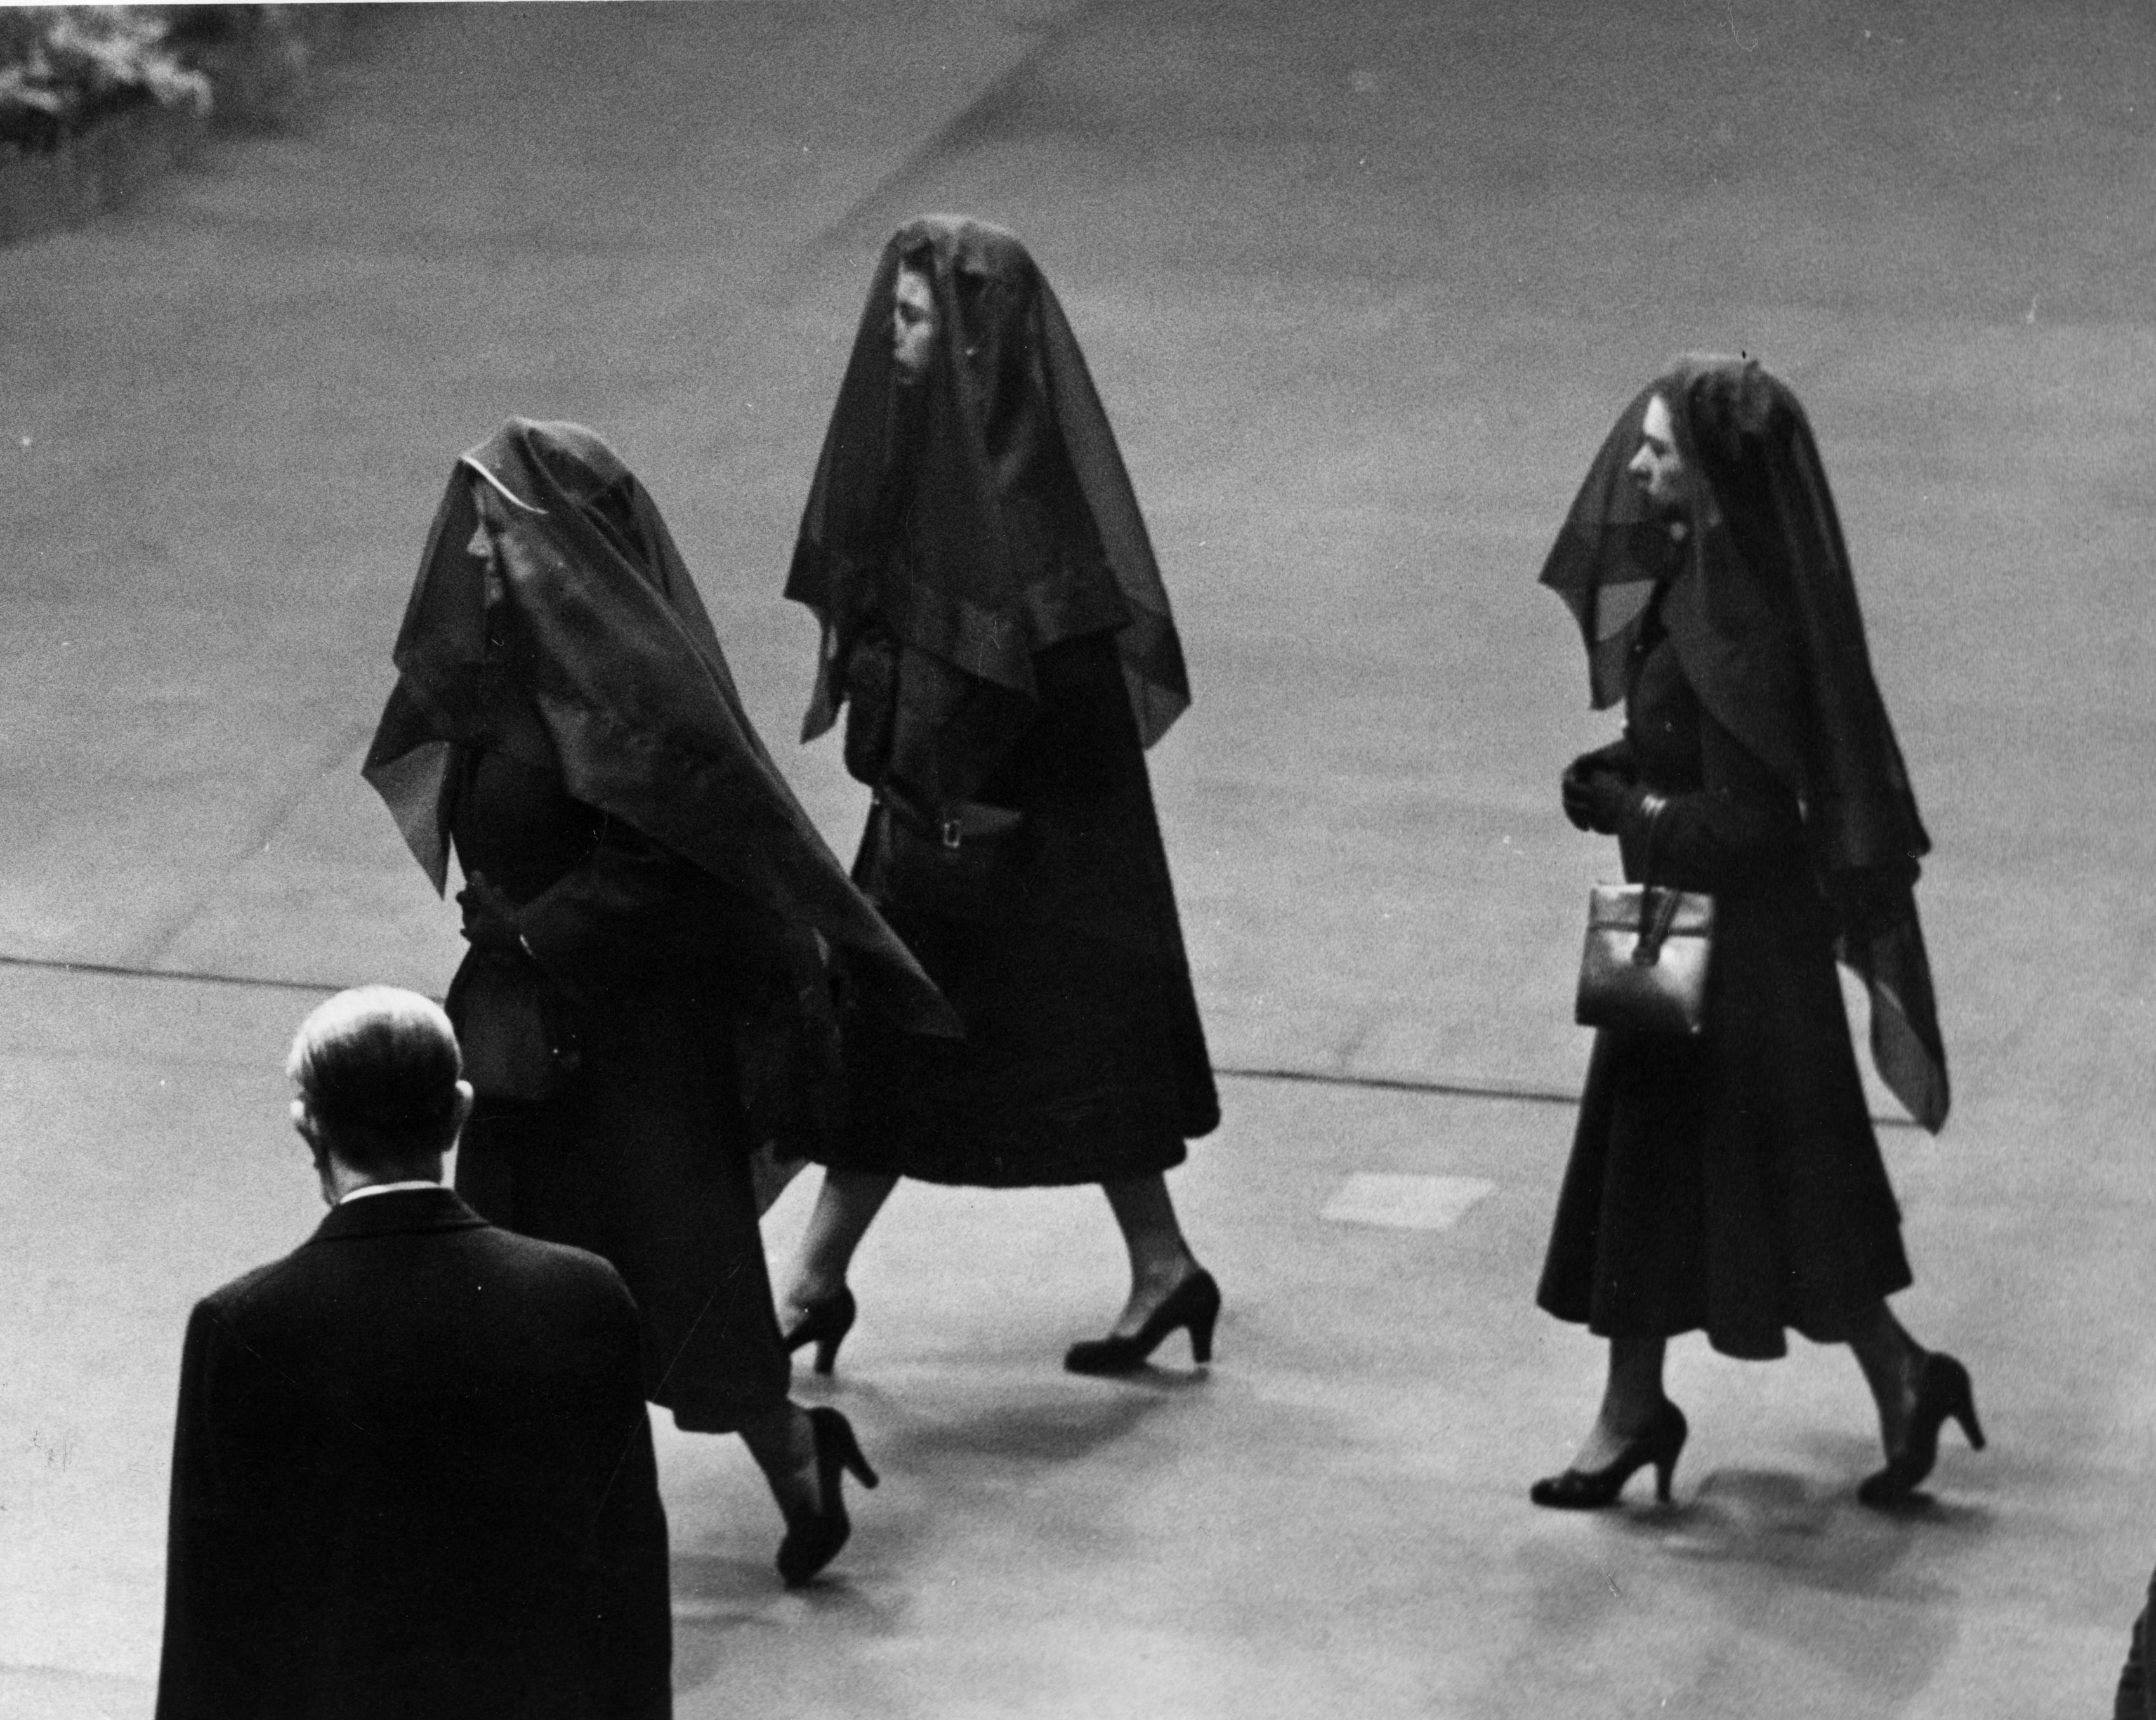 Queen Elizabeth the Queen Mother, Queen Elizabeth II, and Princess Margaret wearing veils on their way to the funeral of King George VI.